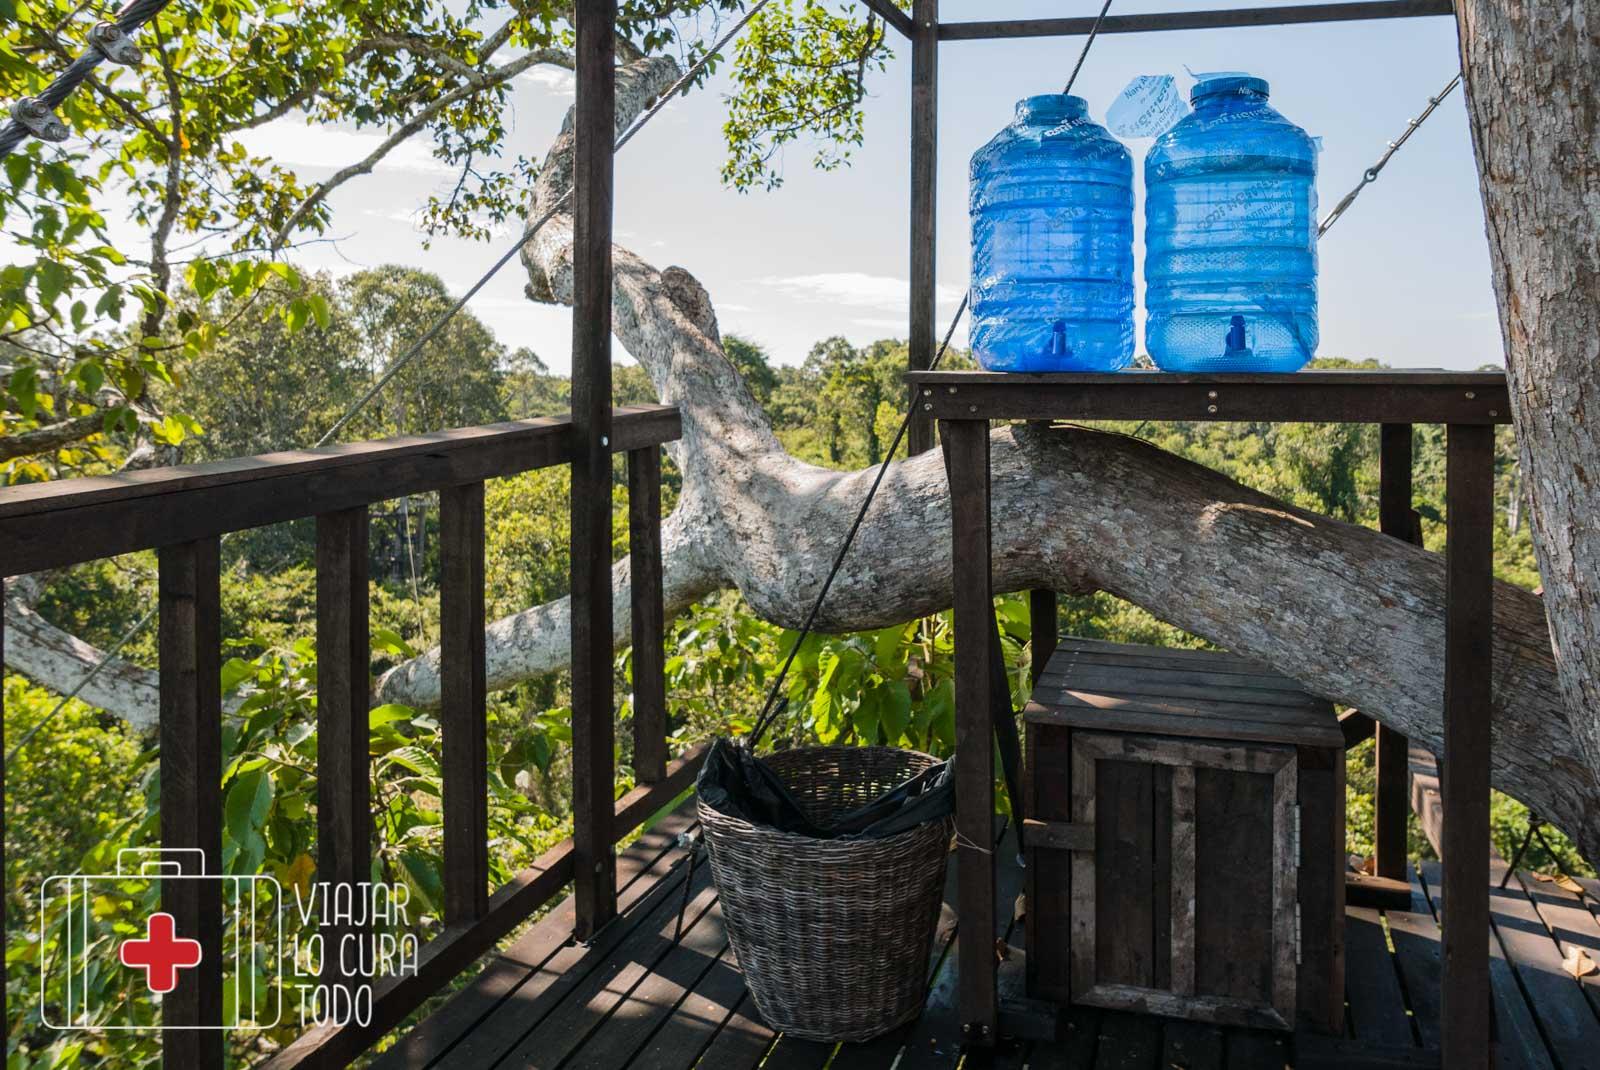 Pausa para beber agua